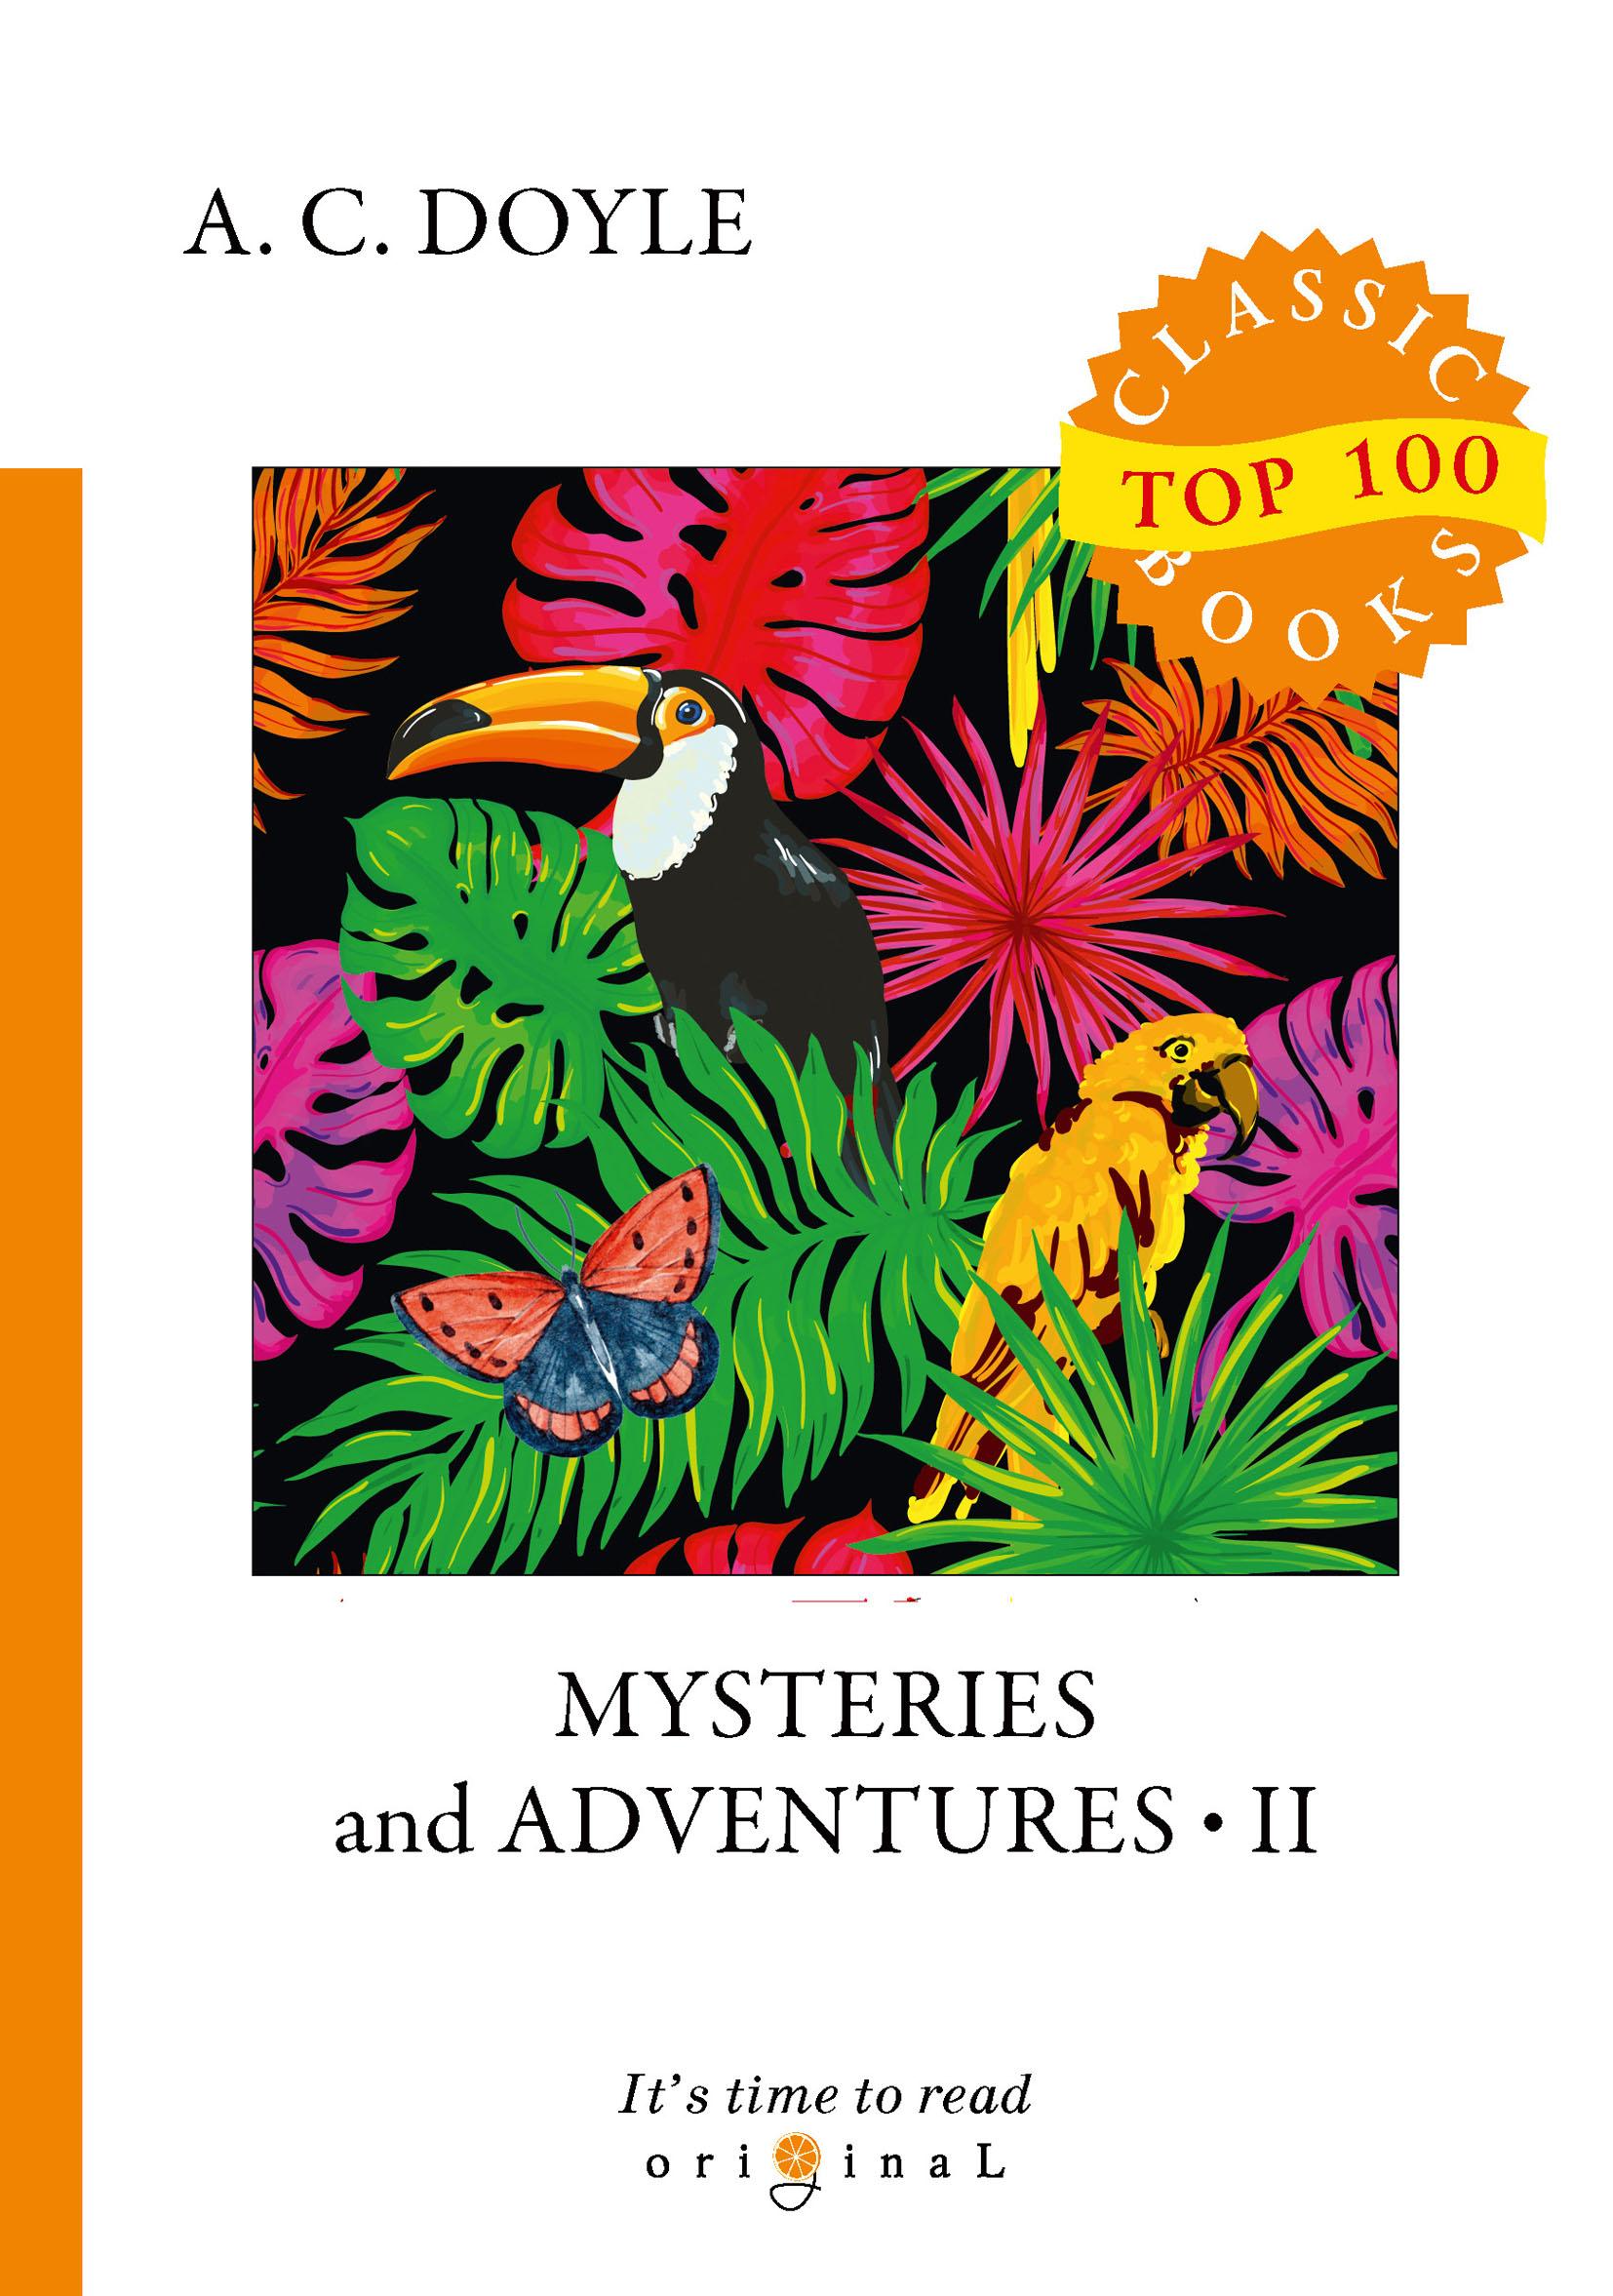 A. C. Doyle Mysteries and Adventures II doyle a c memories and adventures воспоминания и приключения на англ яз doyle a c